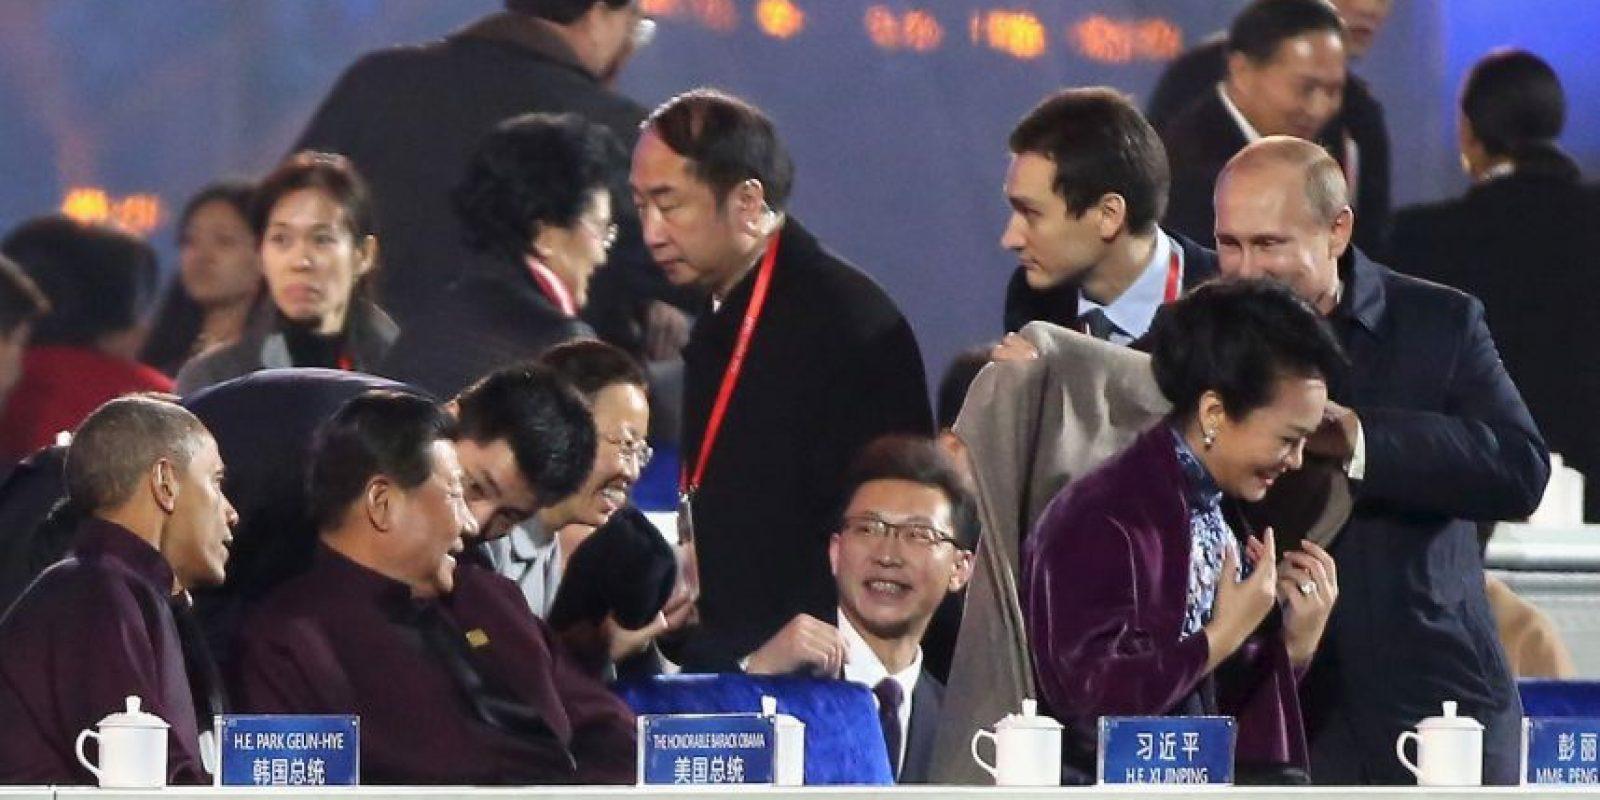 Esta imagen causó polémica entre la sociedad china ya que muestra al presidente de Rusia ofreciendo una manta a Peng Liyuan, esposa de Xi Jinping Foto:Getty Images